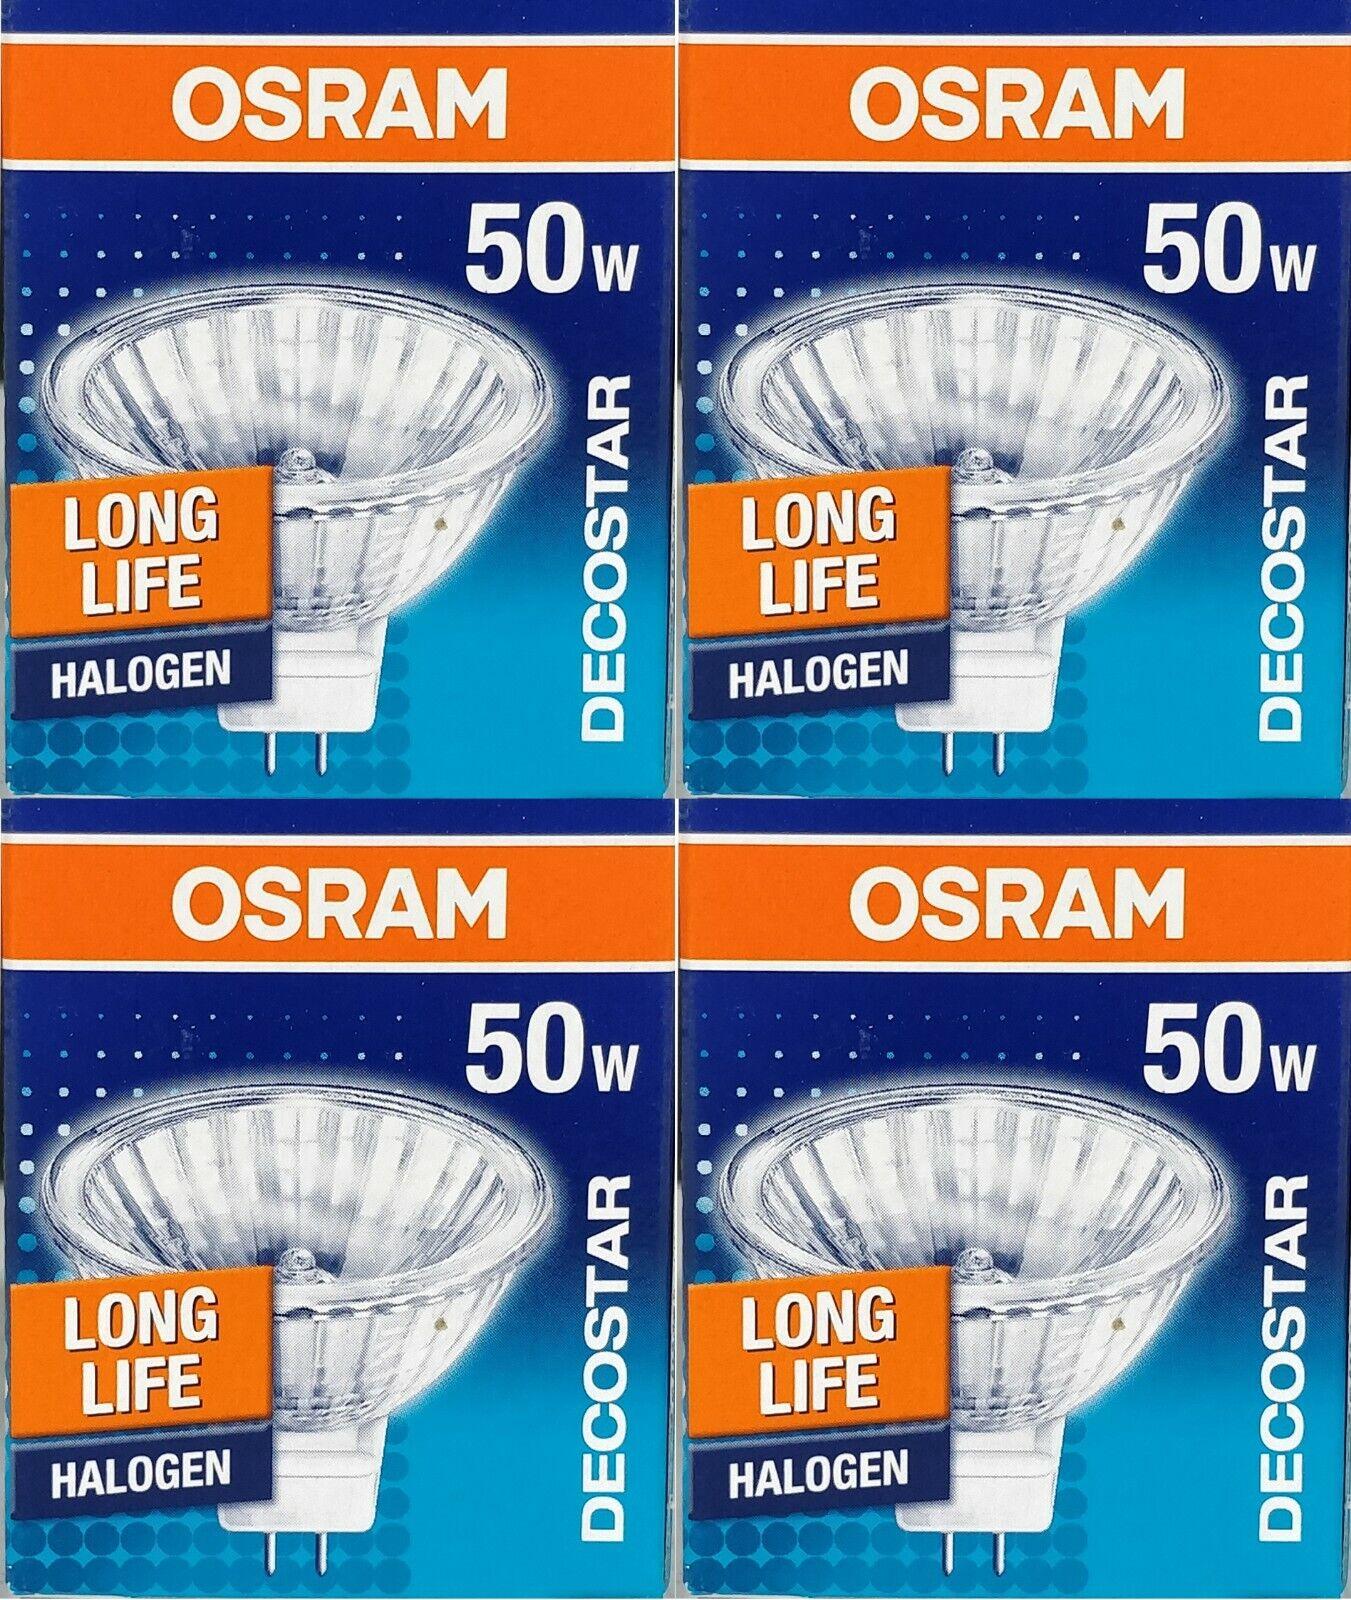 9x 50W MR16 GU5.3 12V Halogen Dichroic UV Filter Dimmable Spot Light Bulbs Lamps